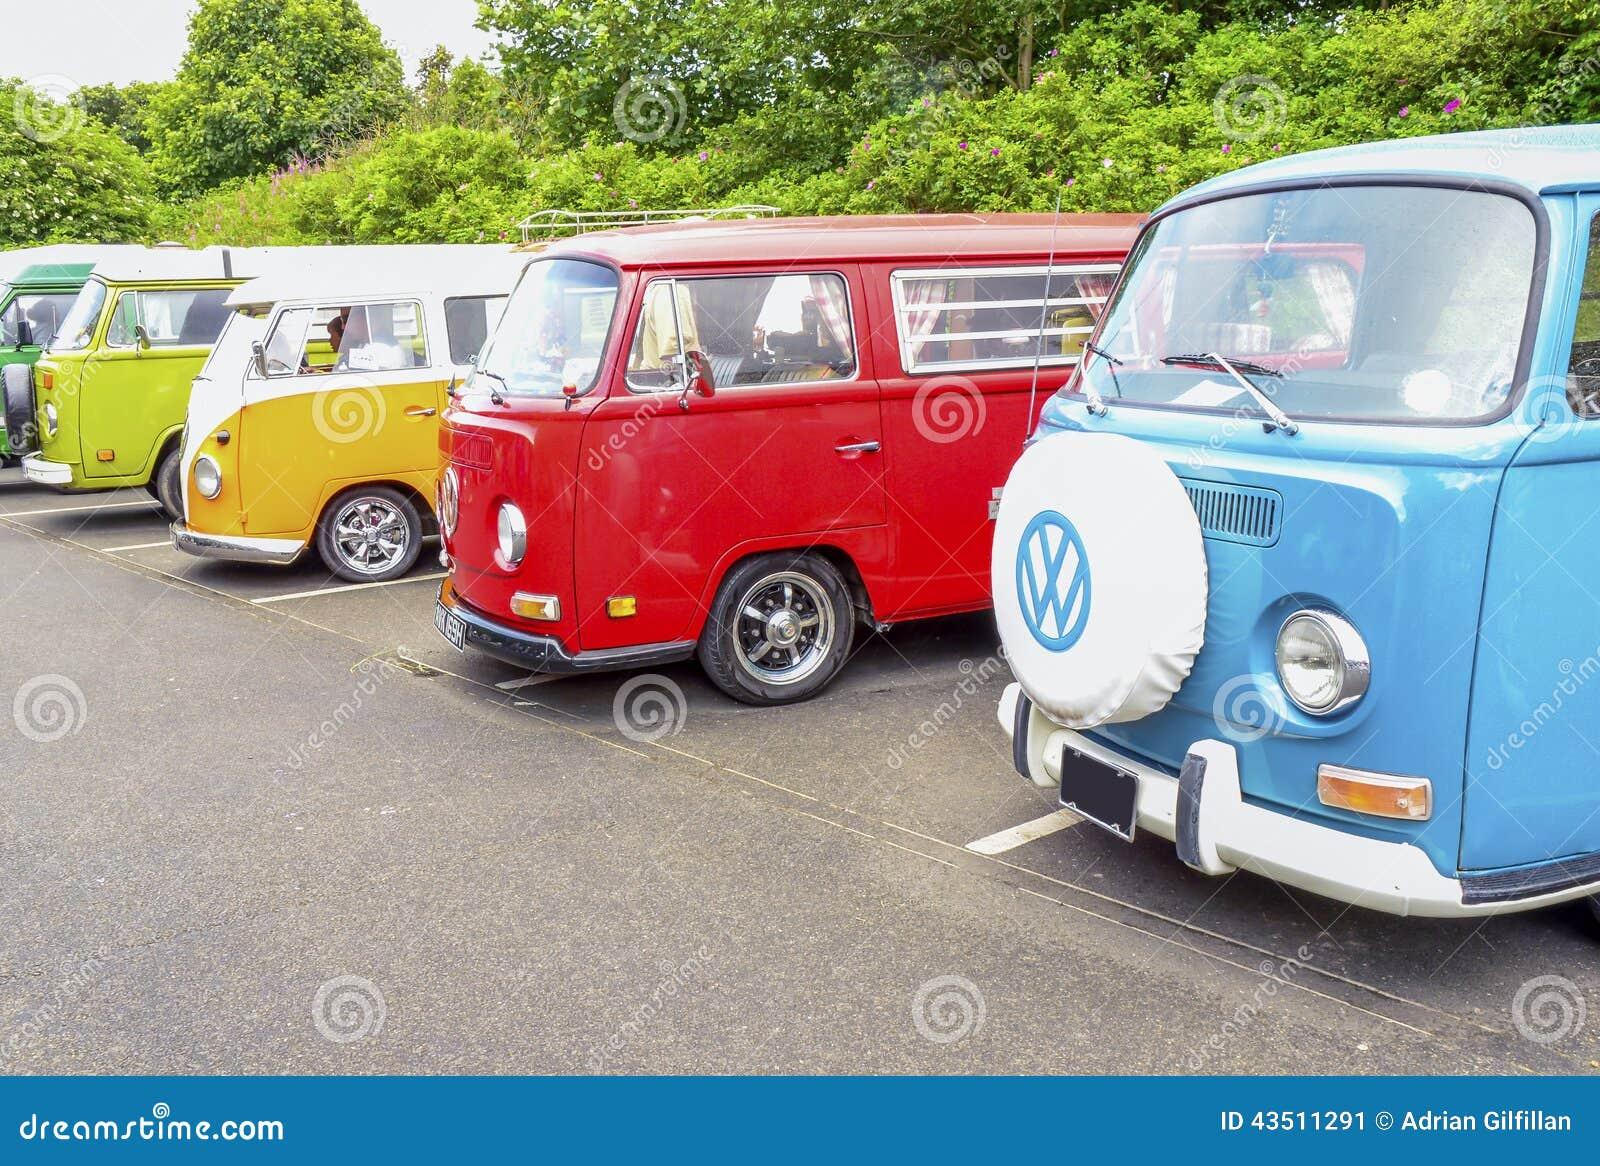 low price sale price reduced huge discount Volkswagen vans editorial photo. Image of automobile - 43511291